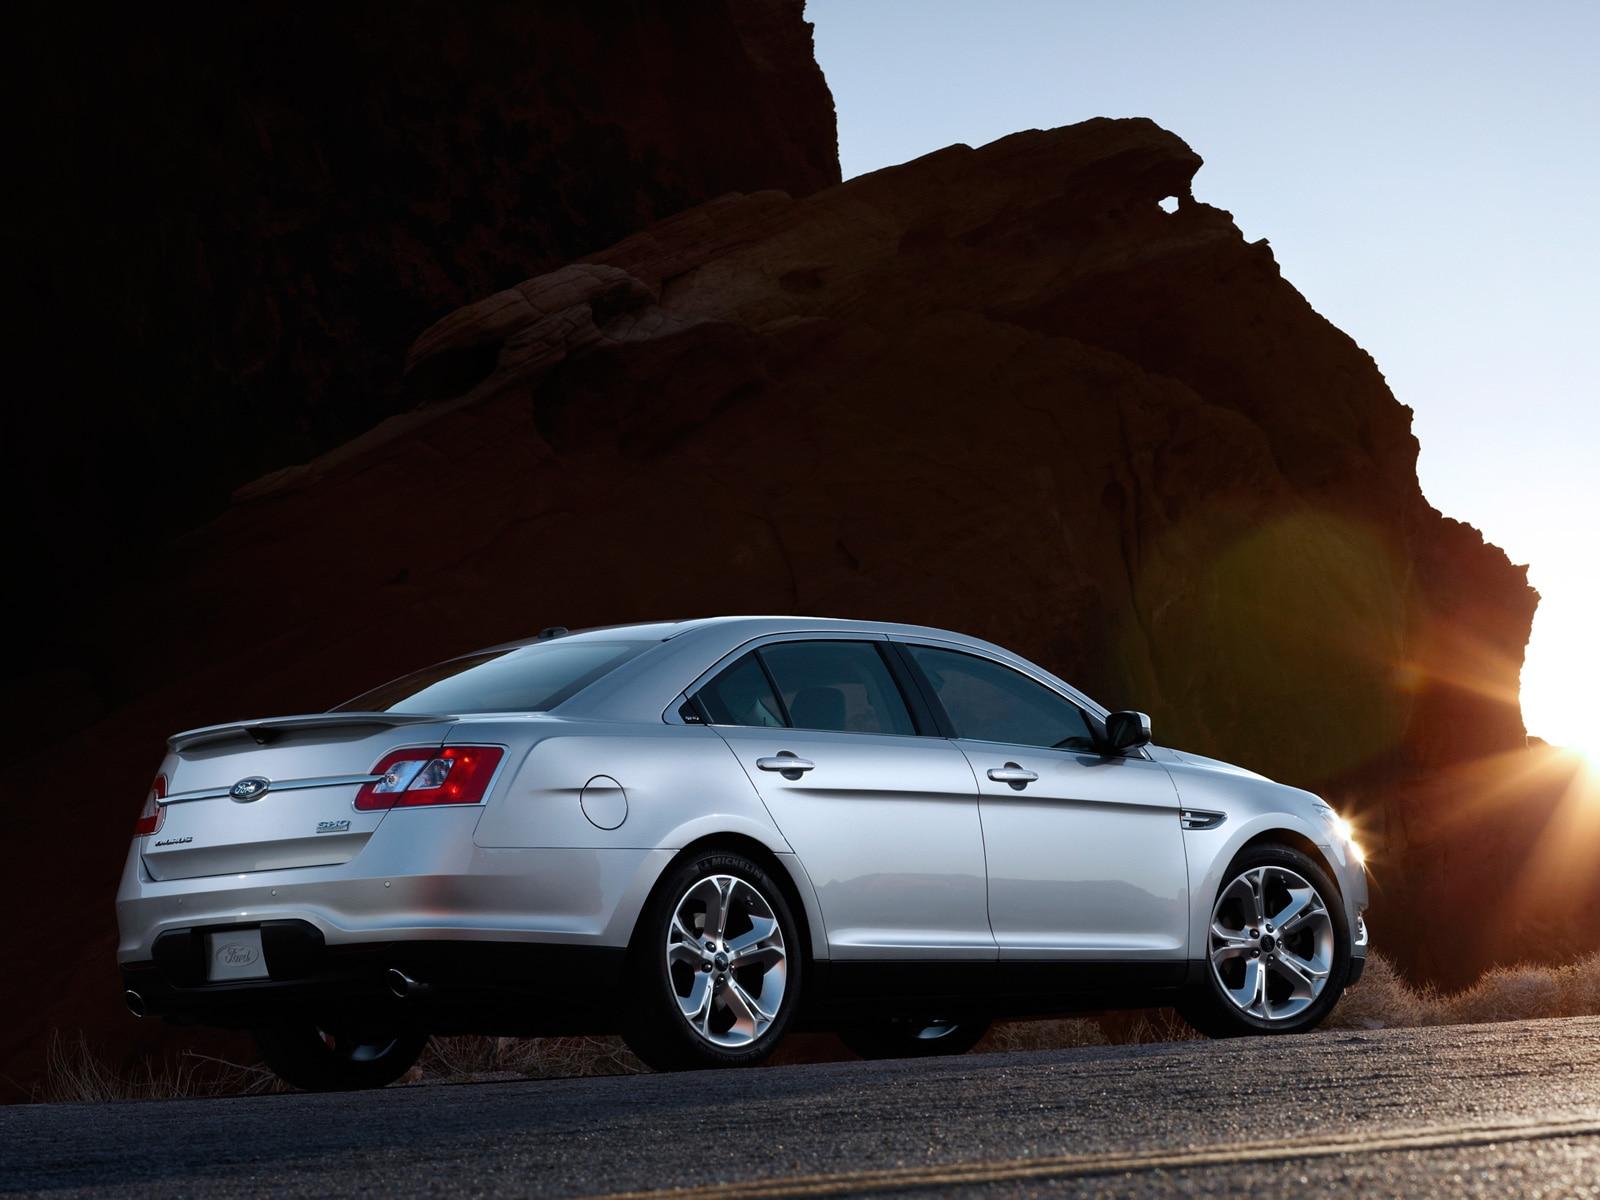 2010 ford taurus sho ford fullsize sport sedan review automobile magazine. Black Bedroom Furniture Sets. Home Design Ideas